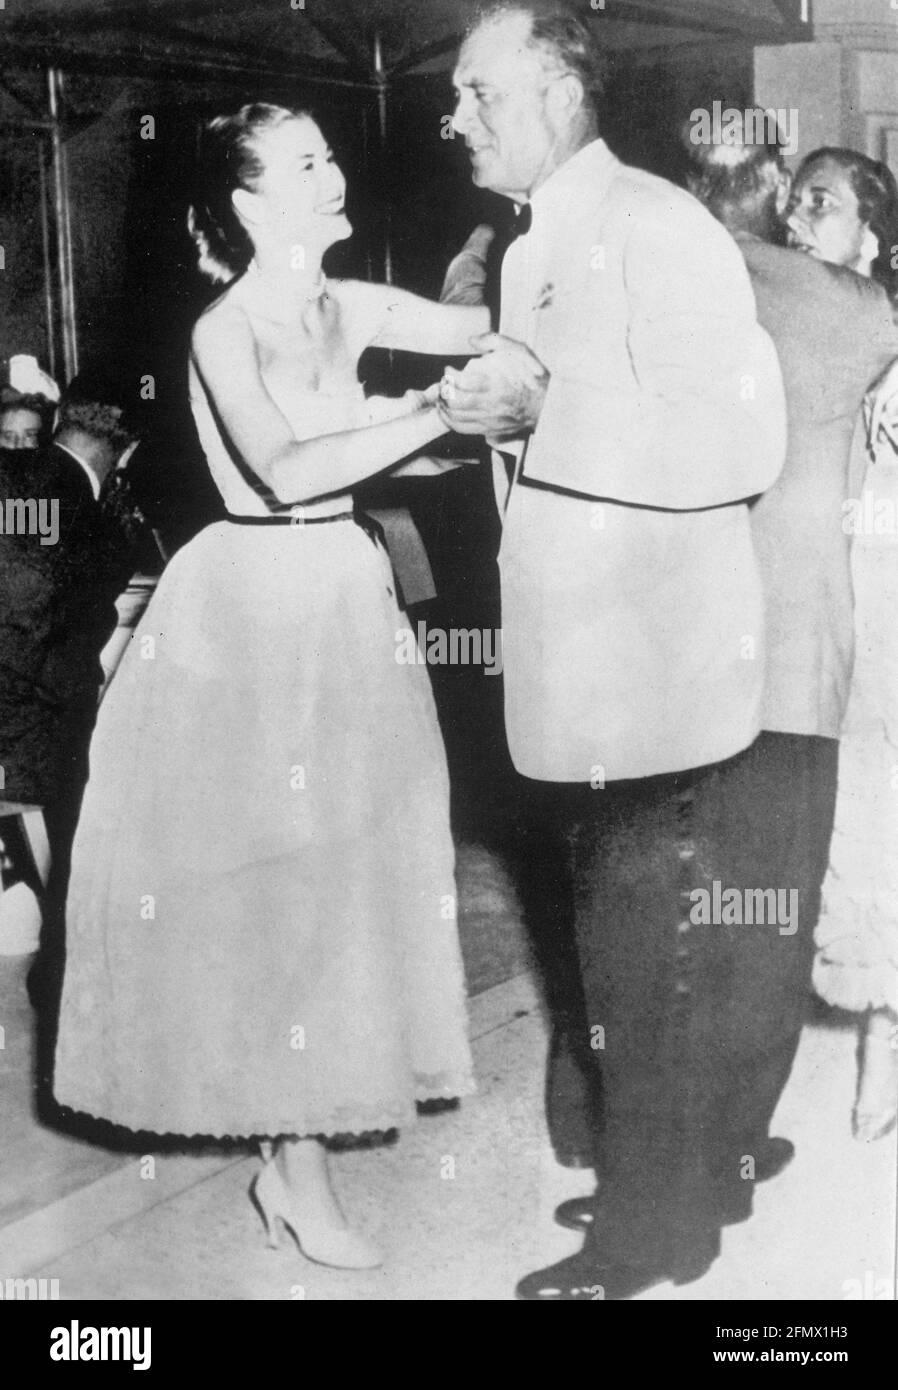 Kelly, Grace, 12.11.1929 -14.9.1982, amerikanische Schauspielerin, mit ihrem Vater John Brendan Kelly, ZUSÄTZLICHE-RIGHTS-CLEARANCE-INFO-NOT-AVAILABLE Stockfoto